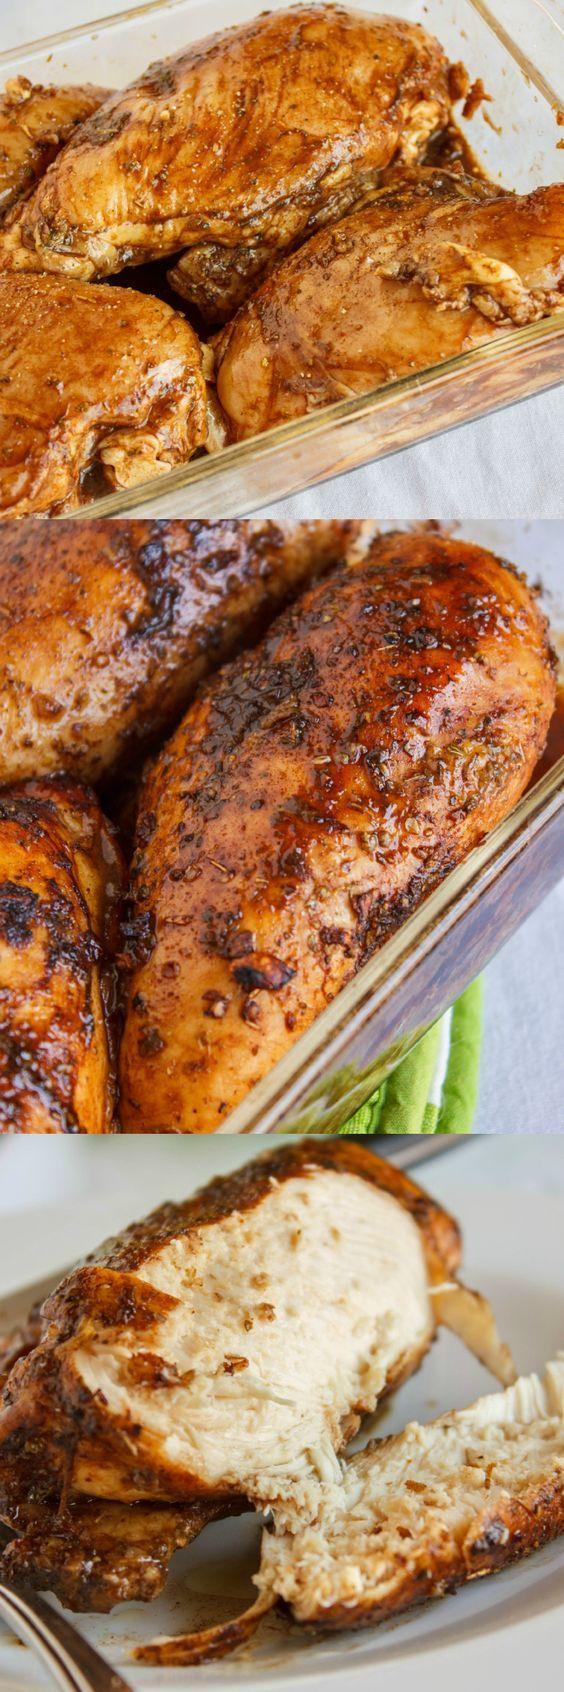 Baked Chicken Breast Recipe Healthy  Baked Balsamic Chicken Recipe